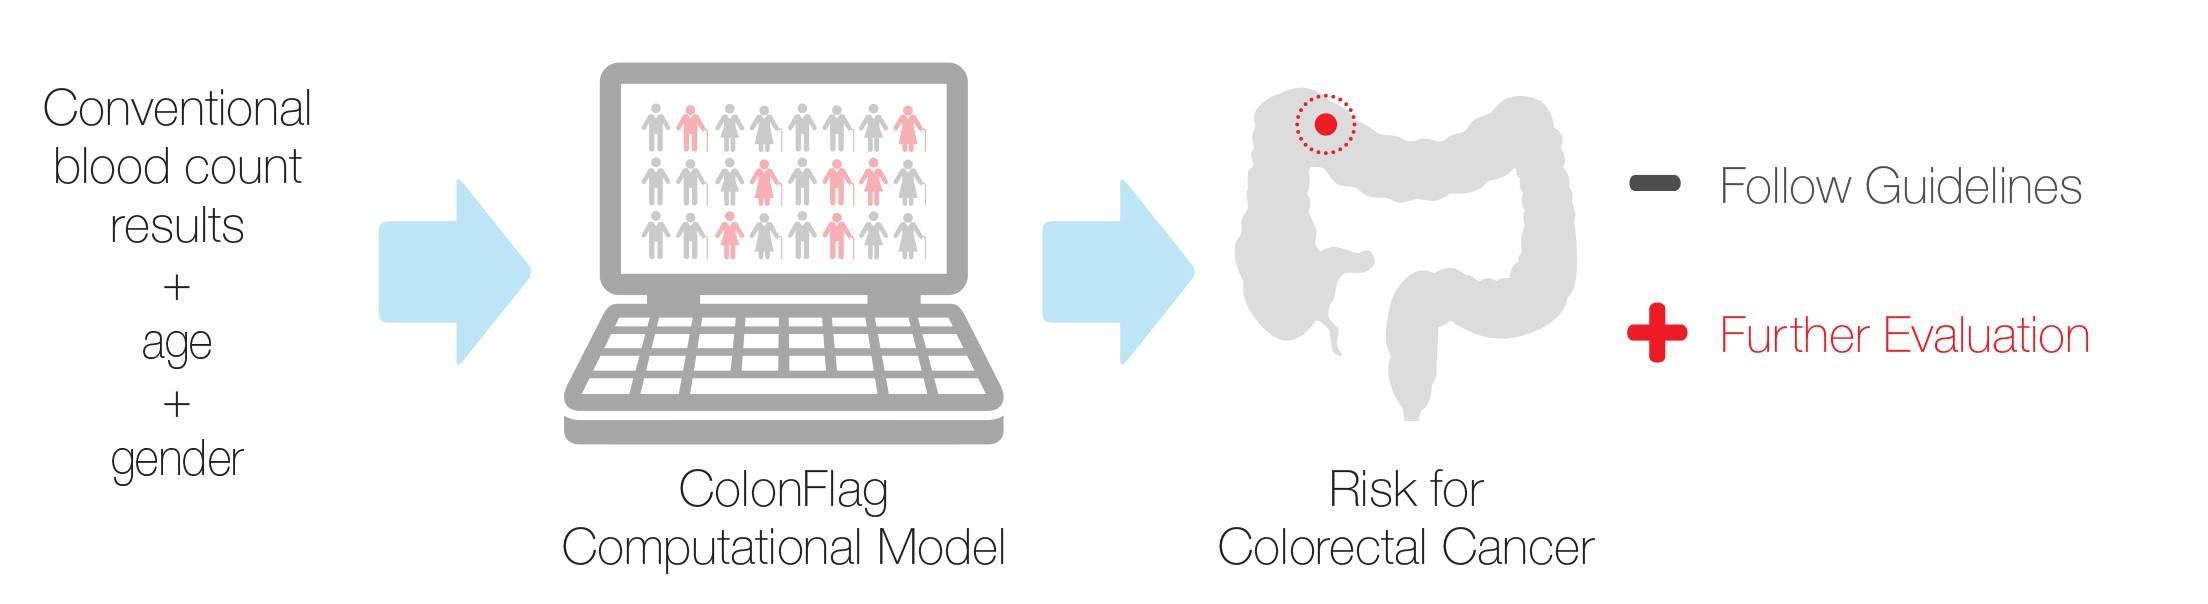 colorectal cancer case study)